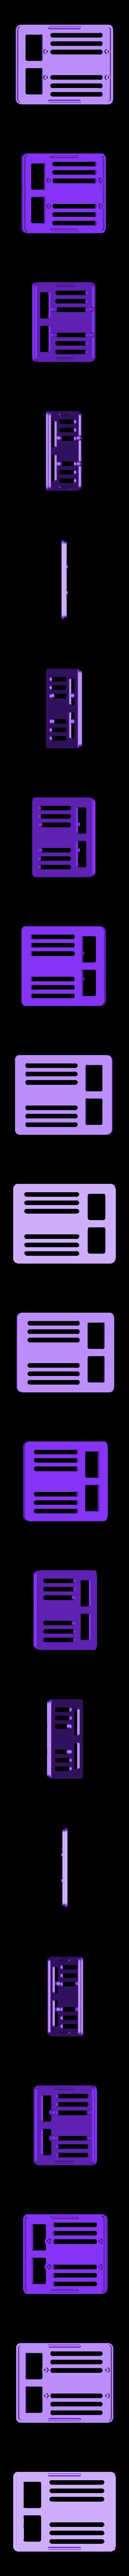 shaker-bottom-cover.stl Download free STL file Crickit Lab Shaker • Template to 3D print, Adafruit